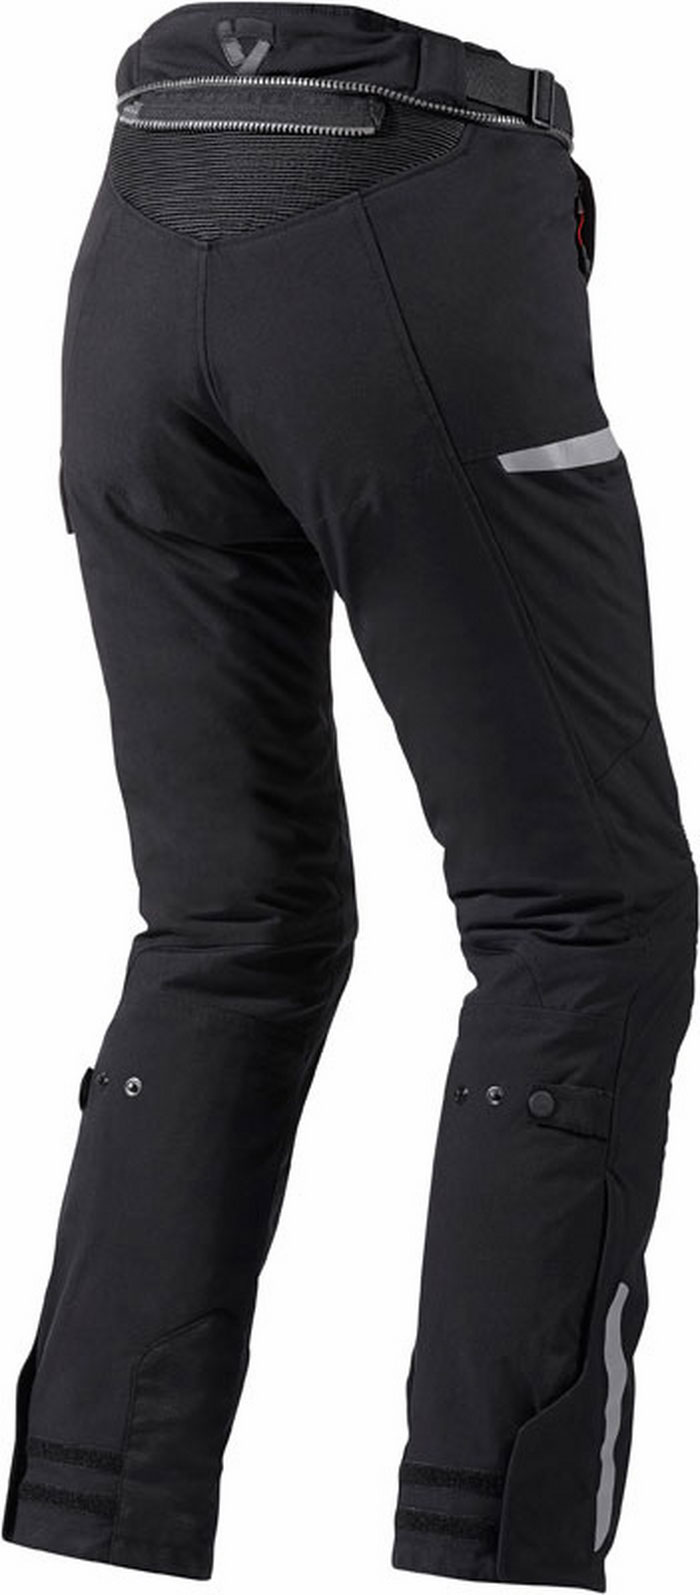 Pantaloni moto donna Rev'It Sand Ladies Nero Allungato